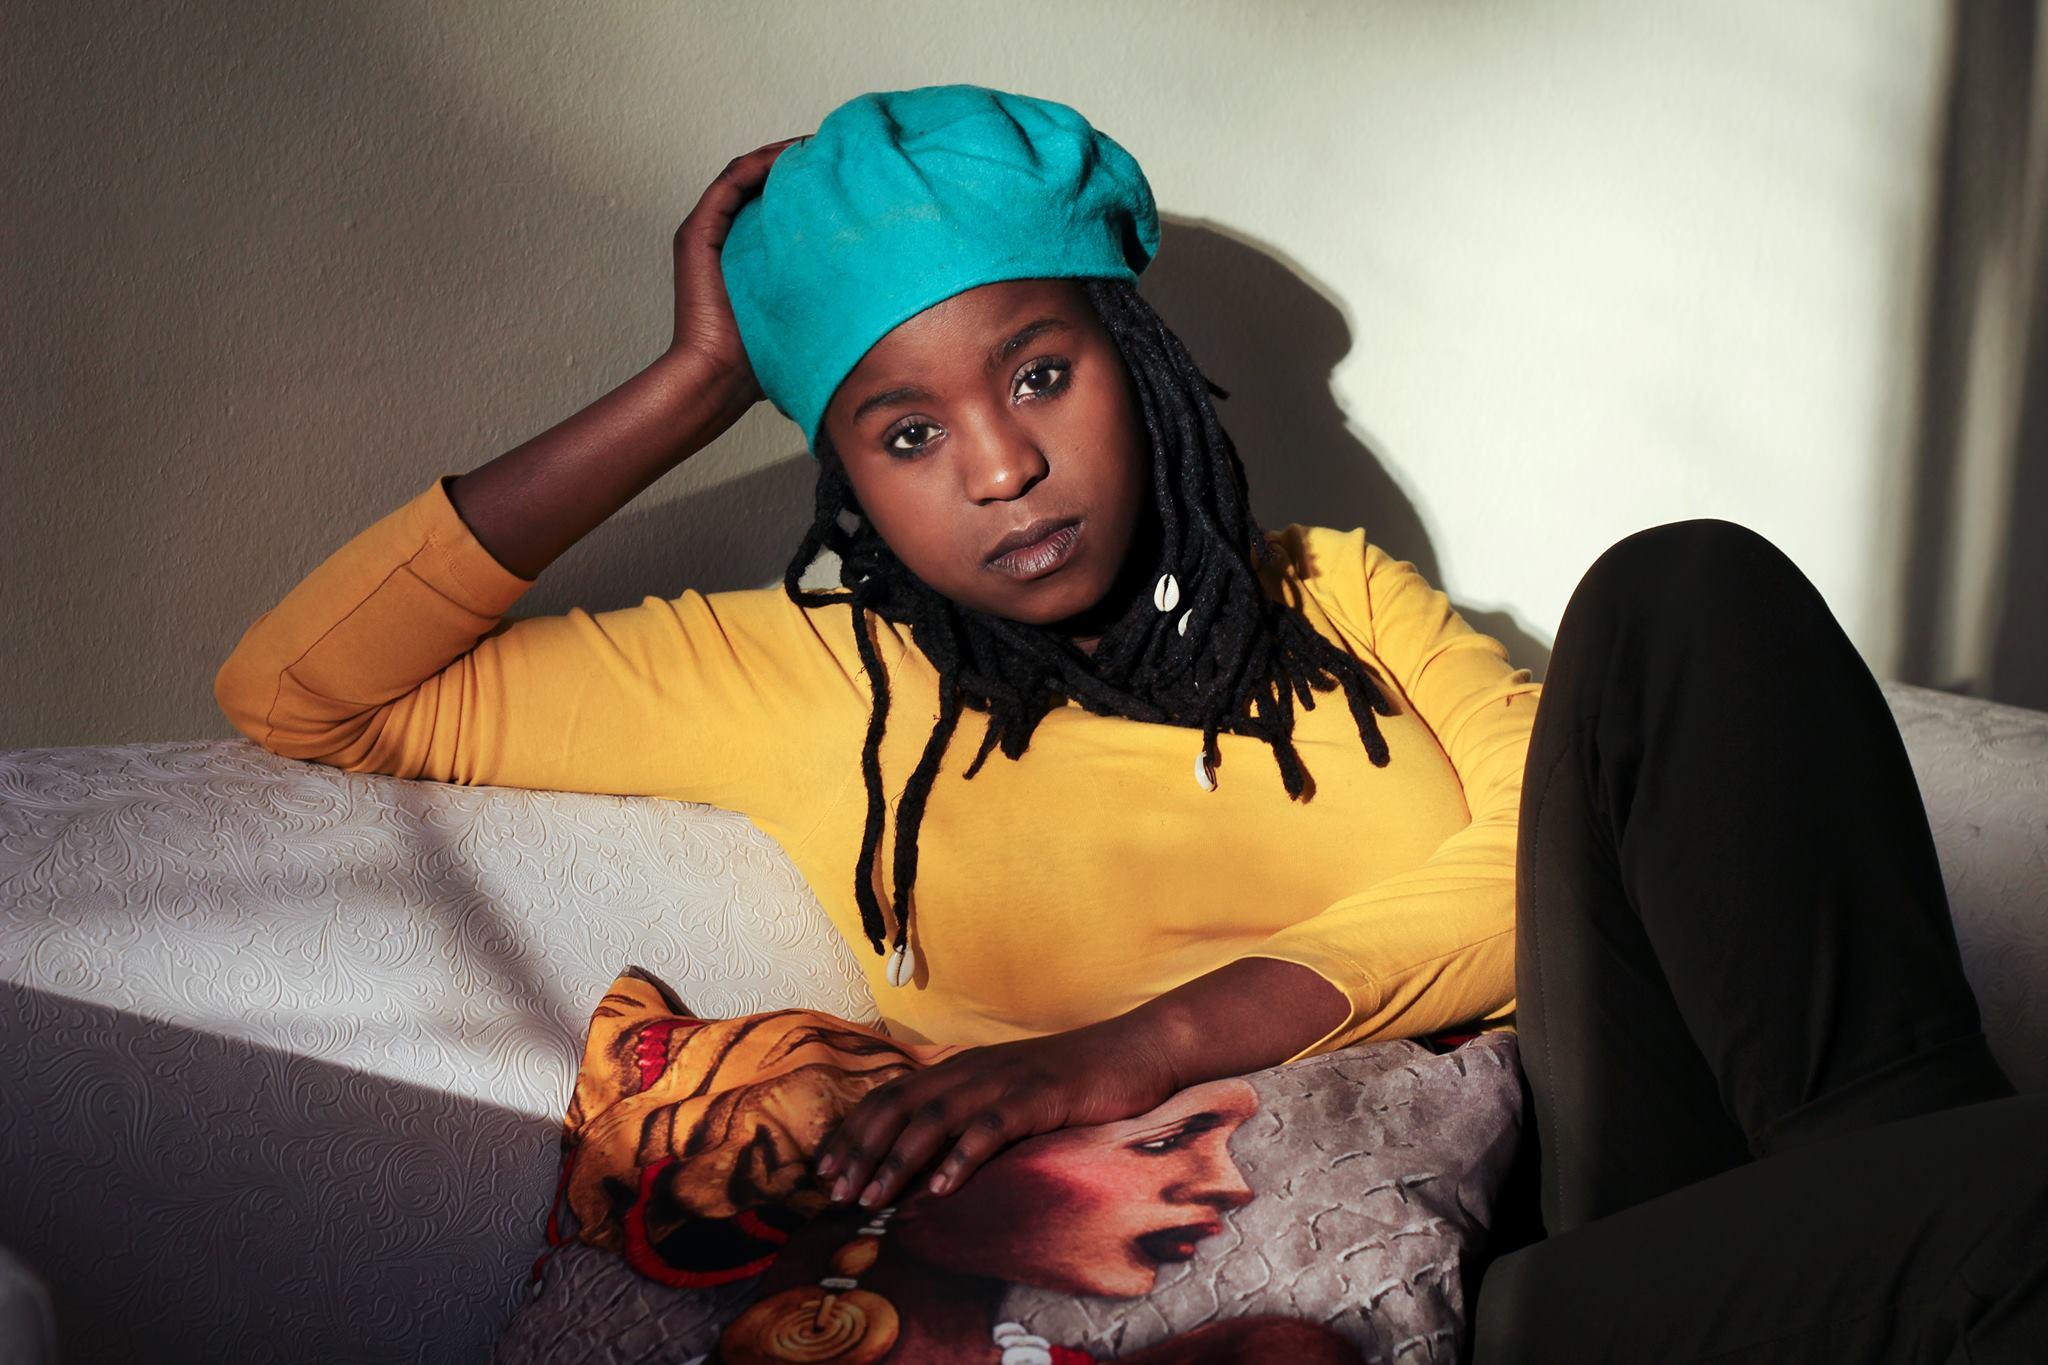 Nyiko Lebogang Shikwambane